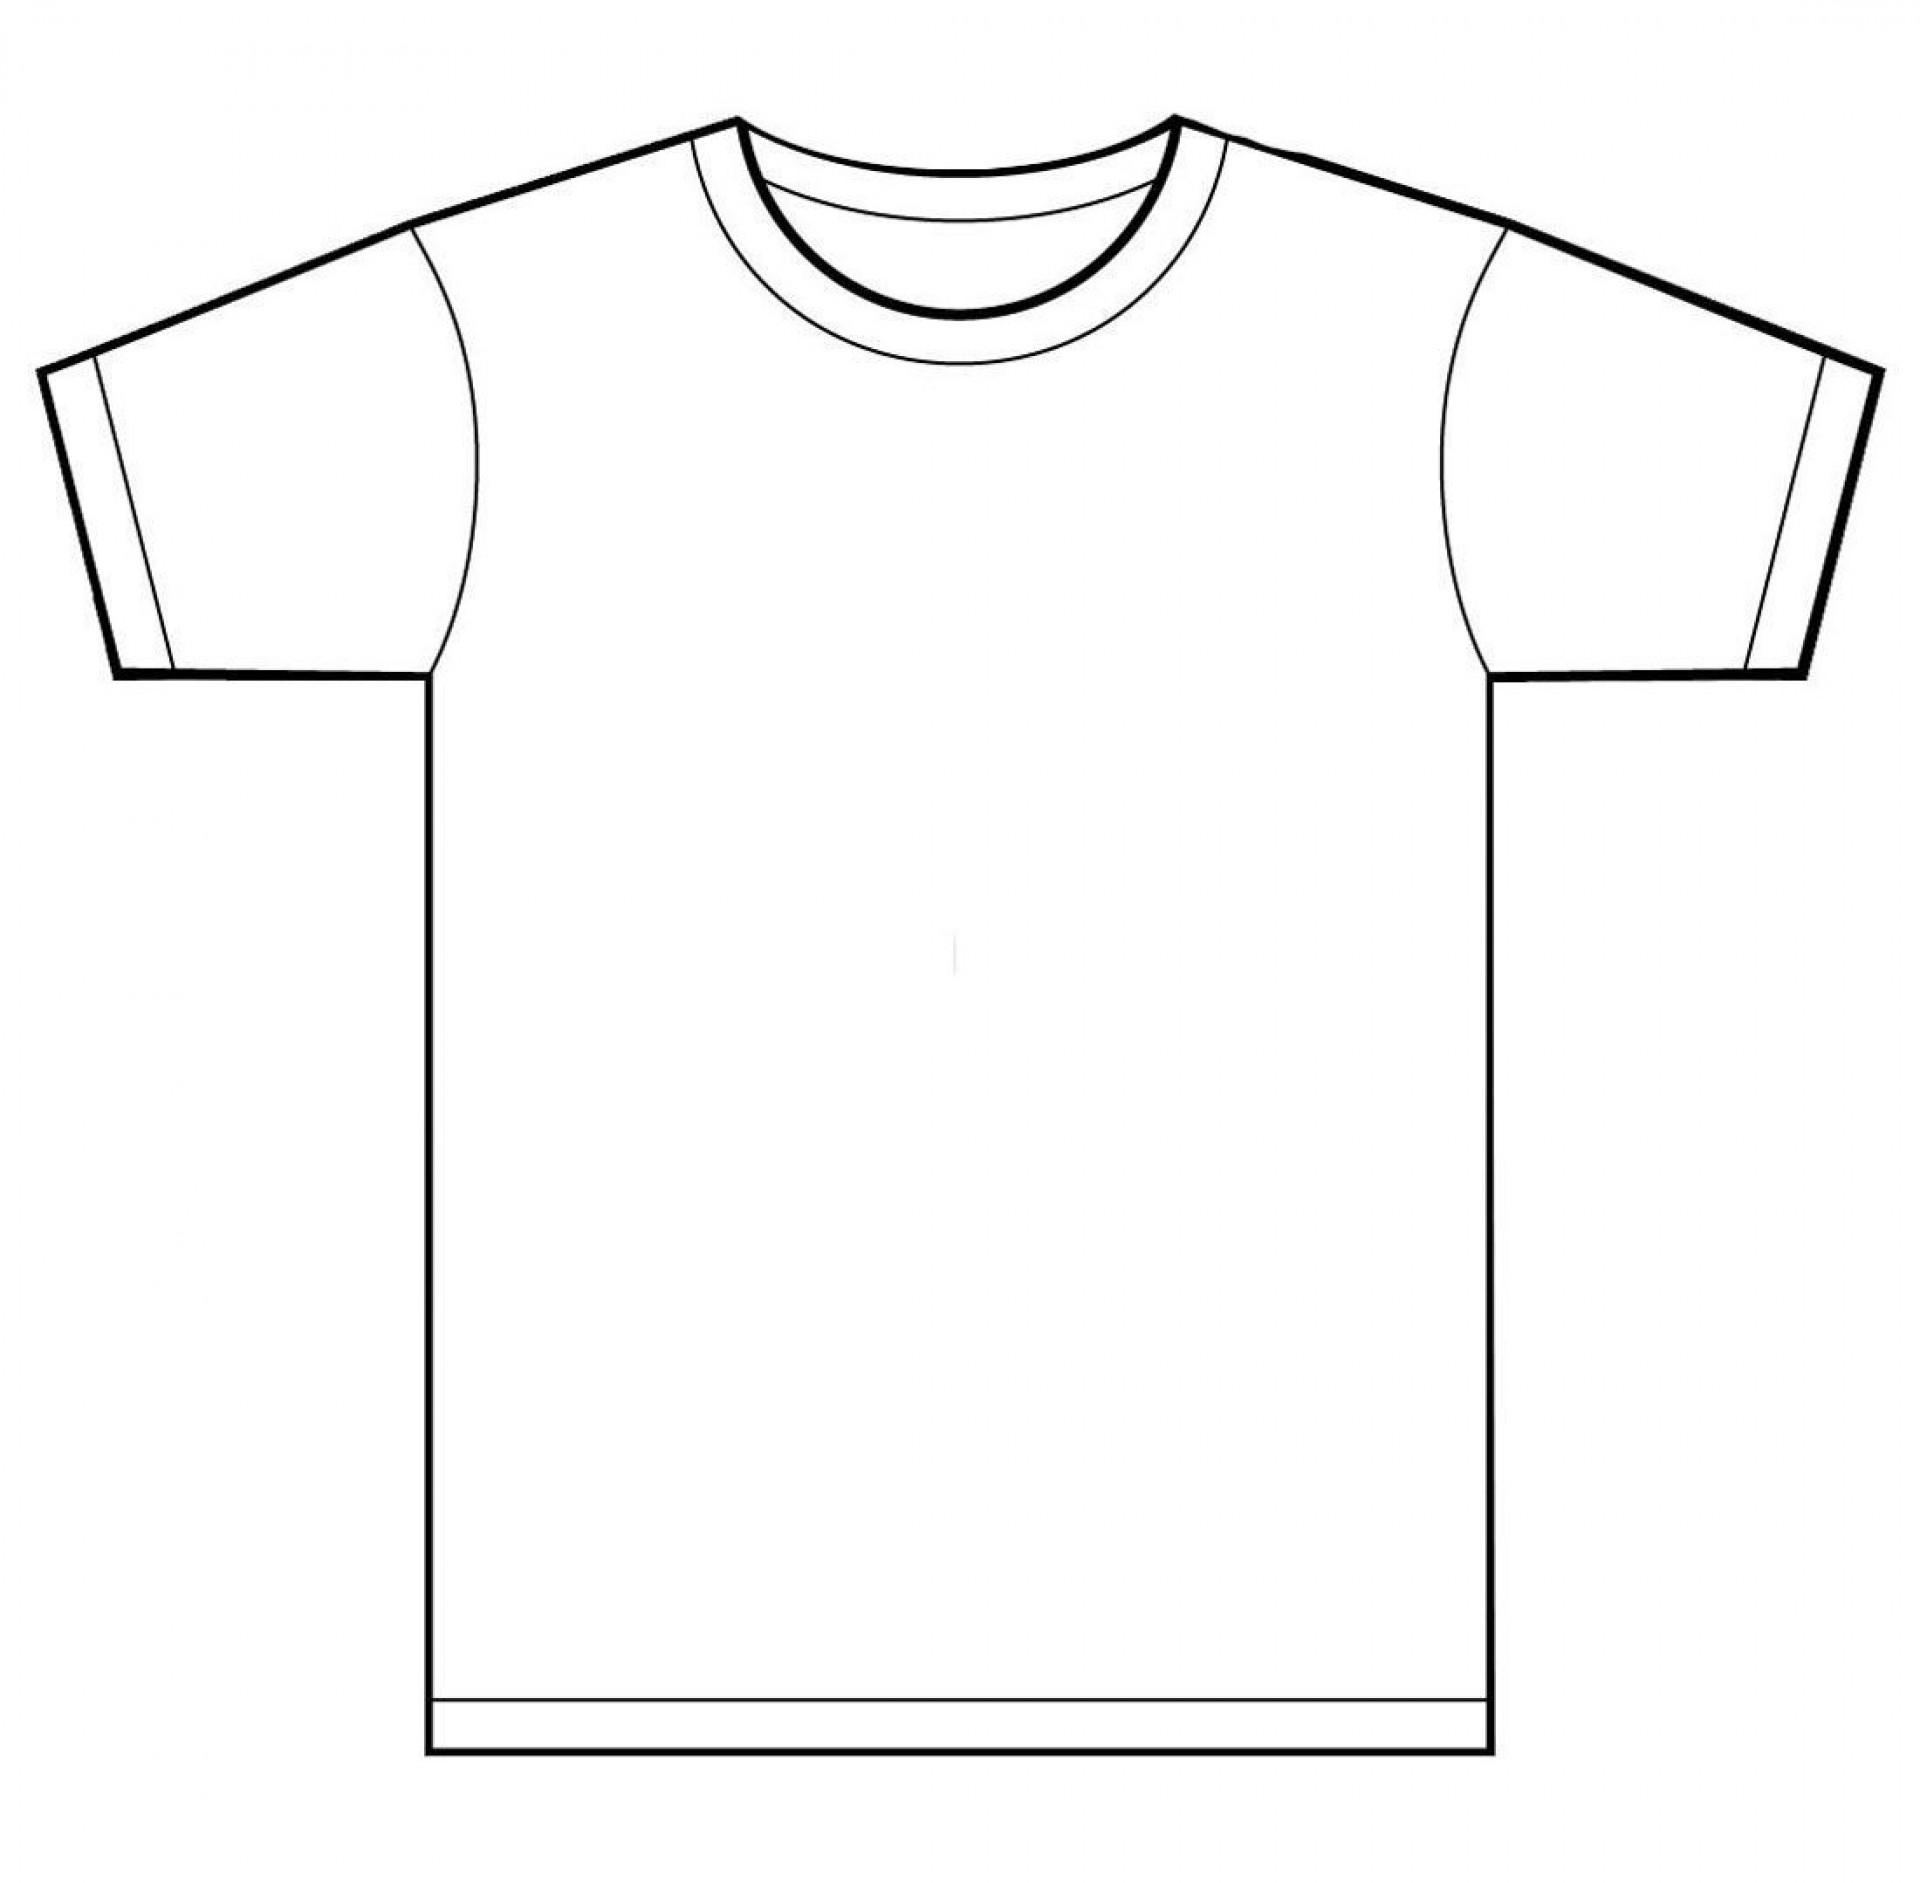 002 Dreaded T Shirt Design Template Free High Resolution  Psd Download1920